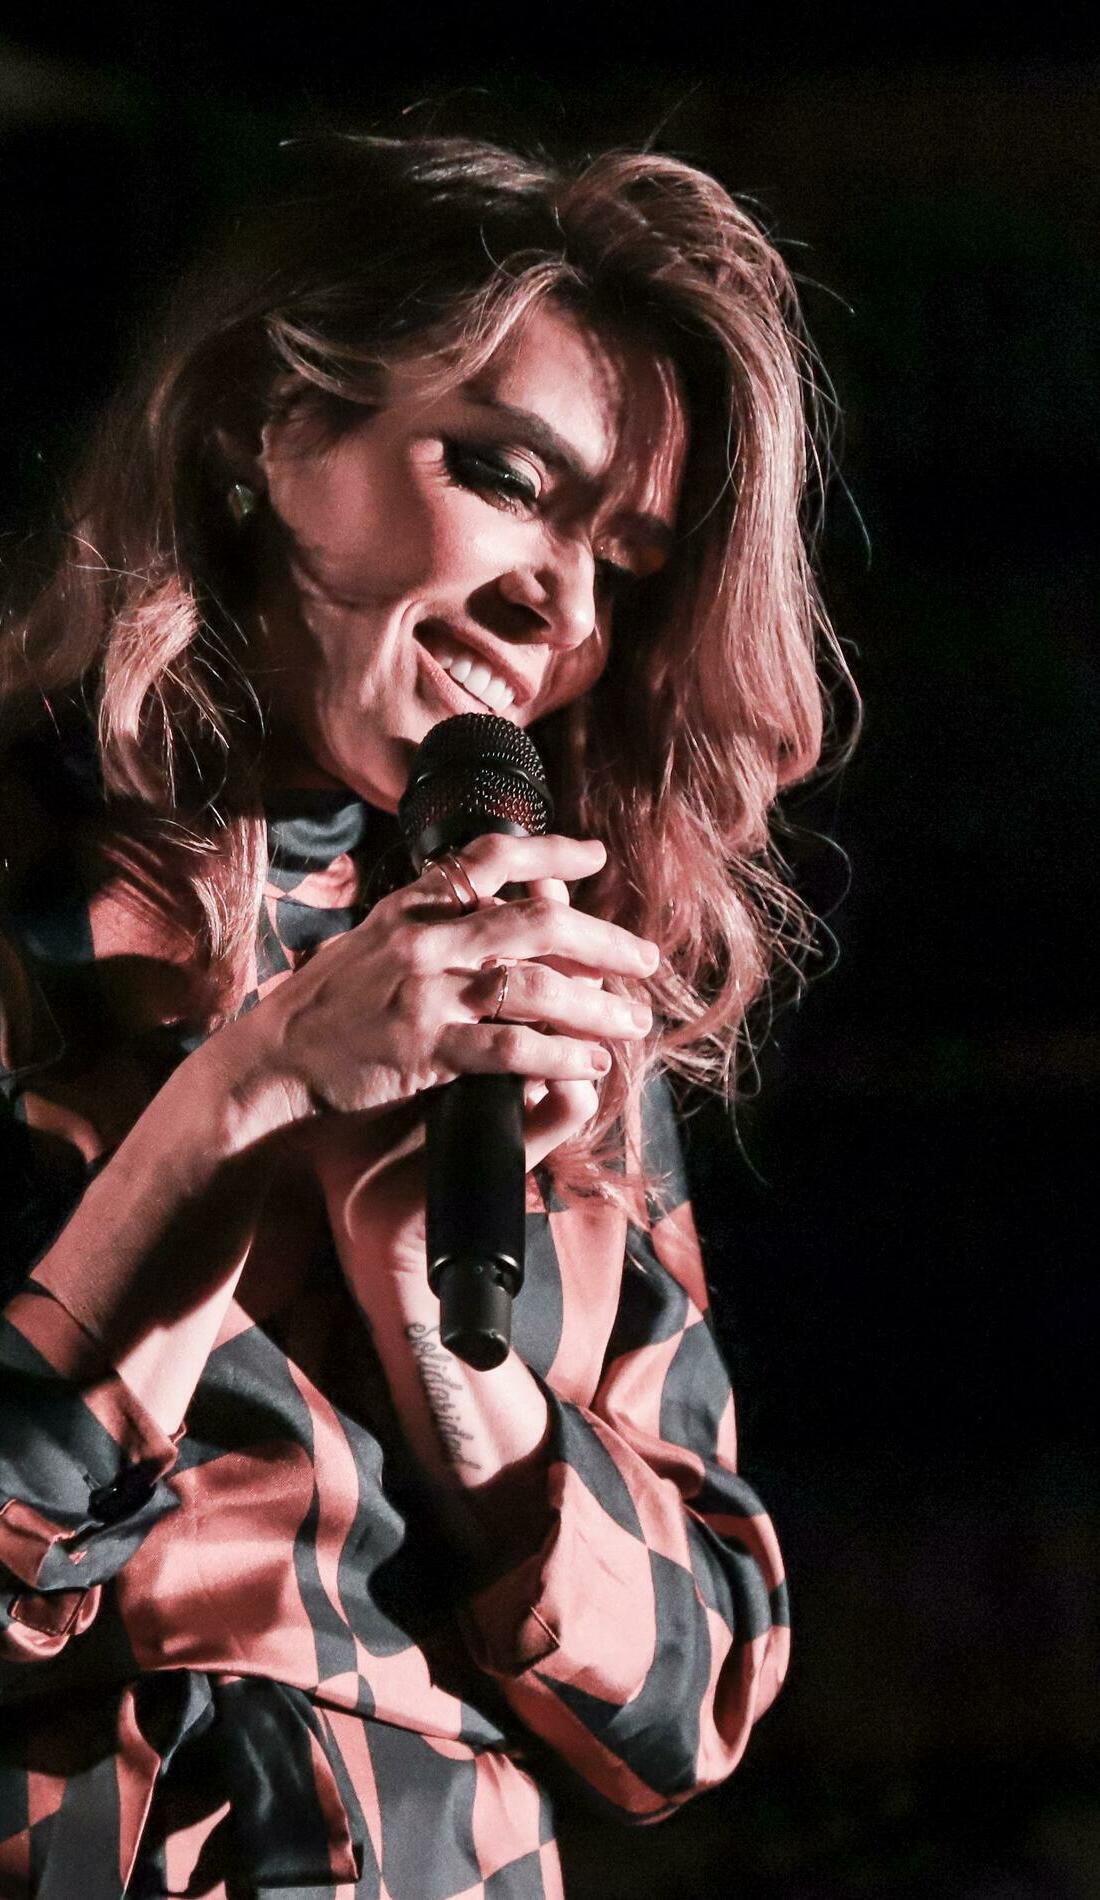 A Kany Garcia live event